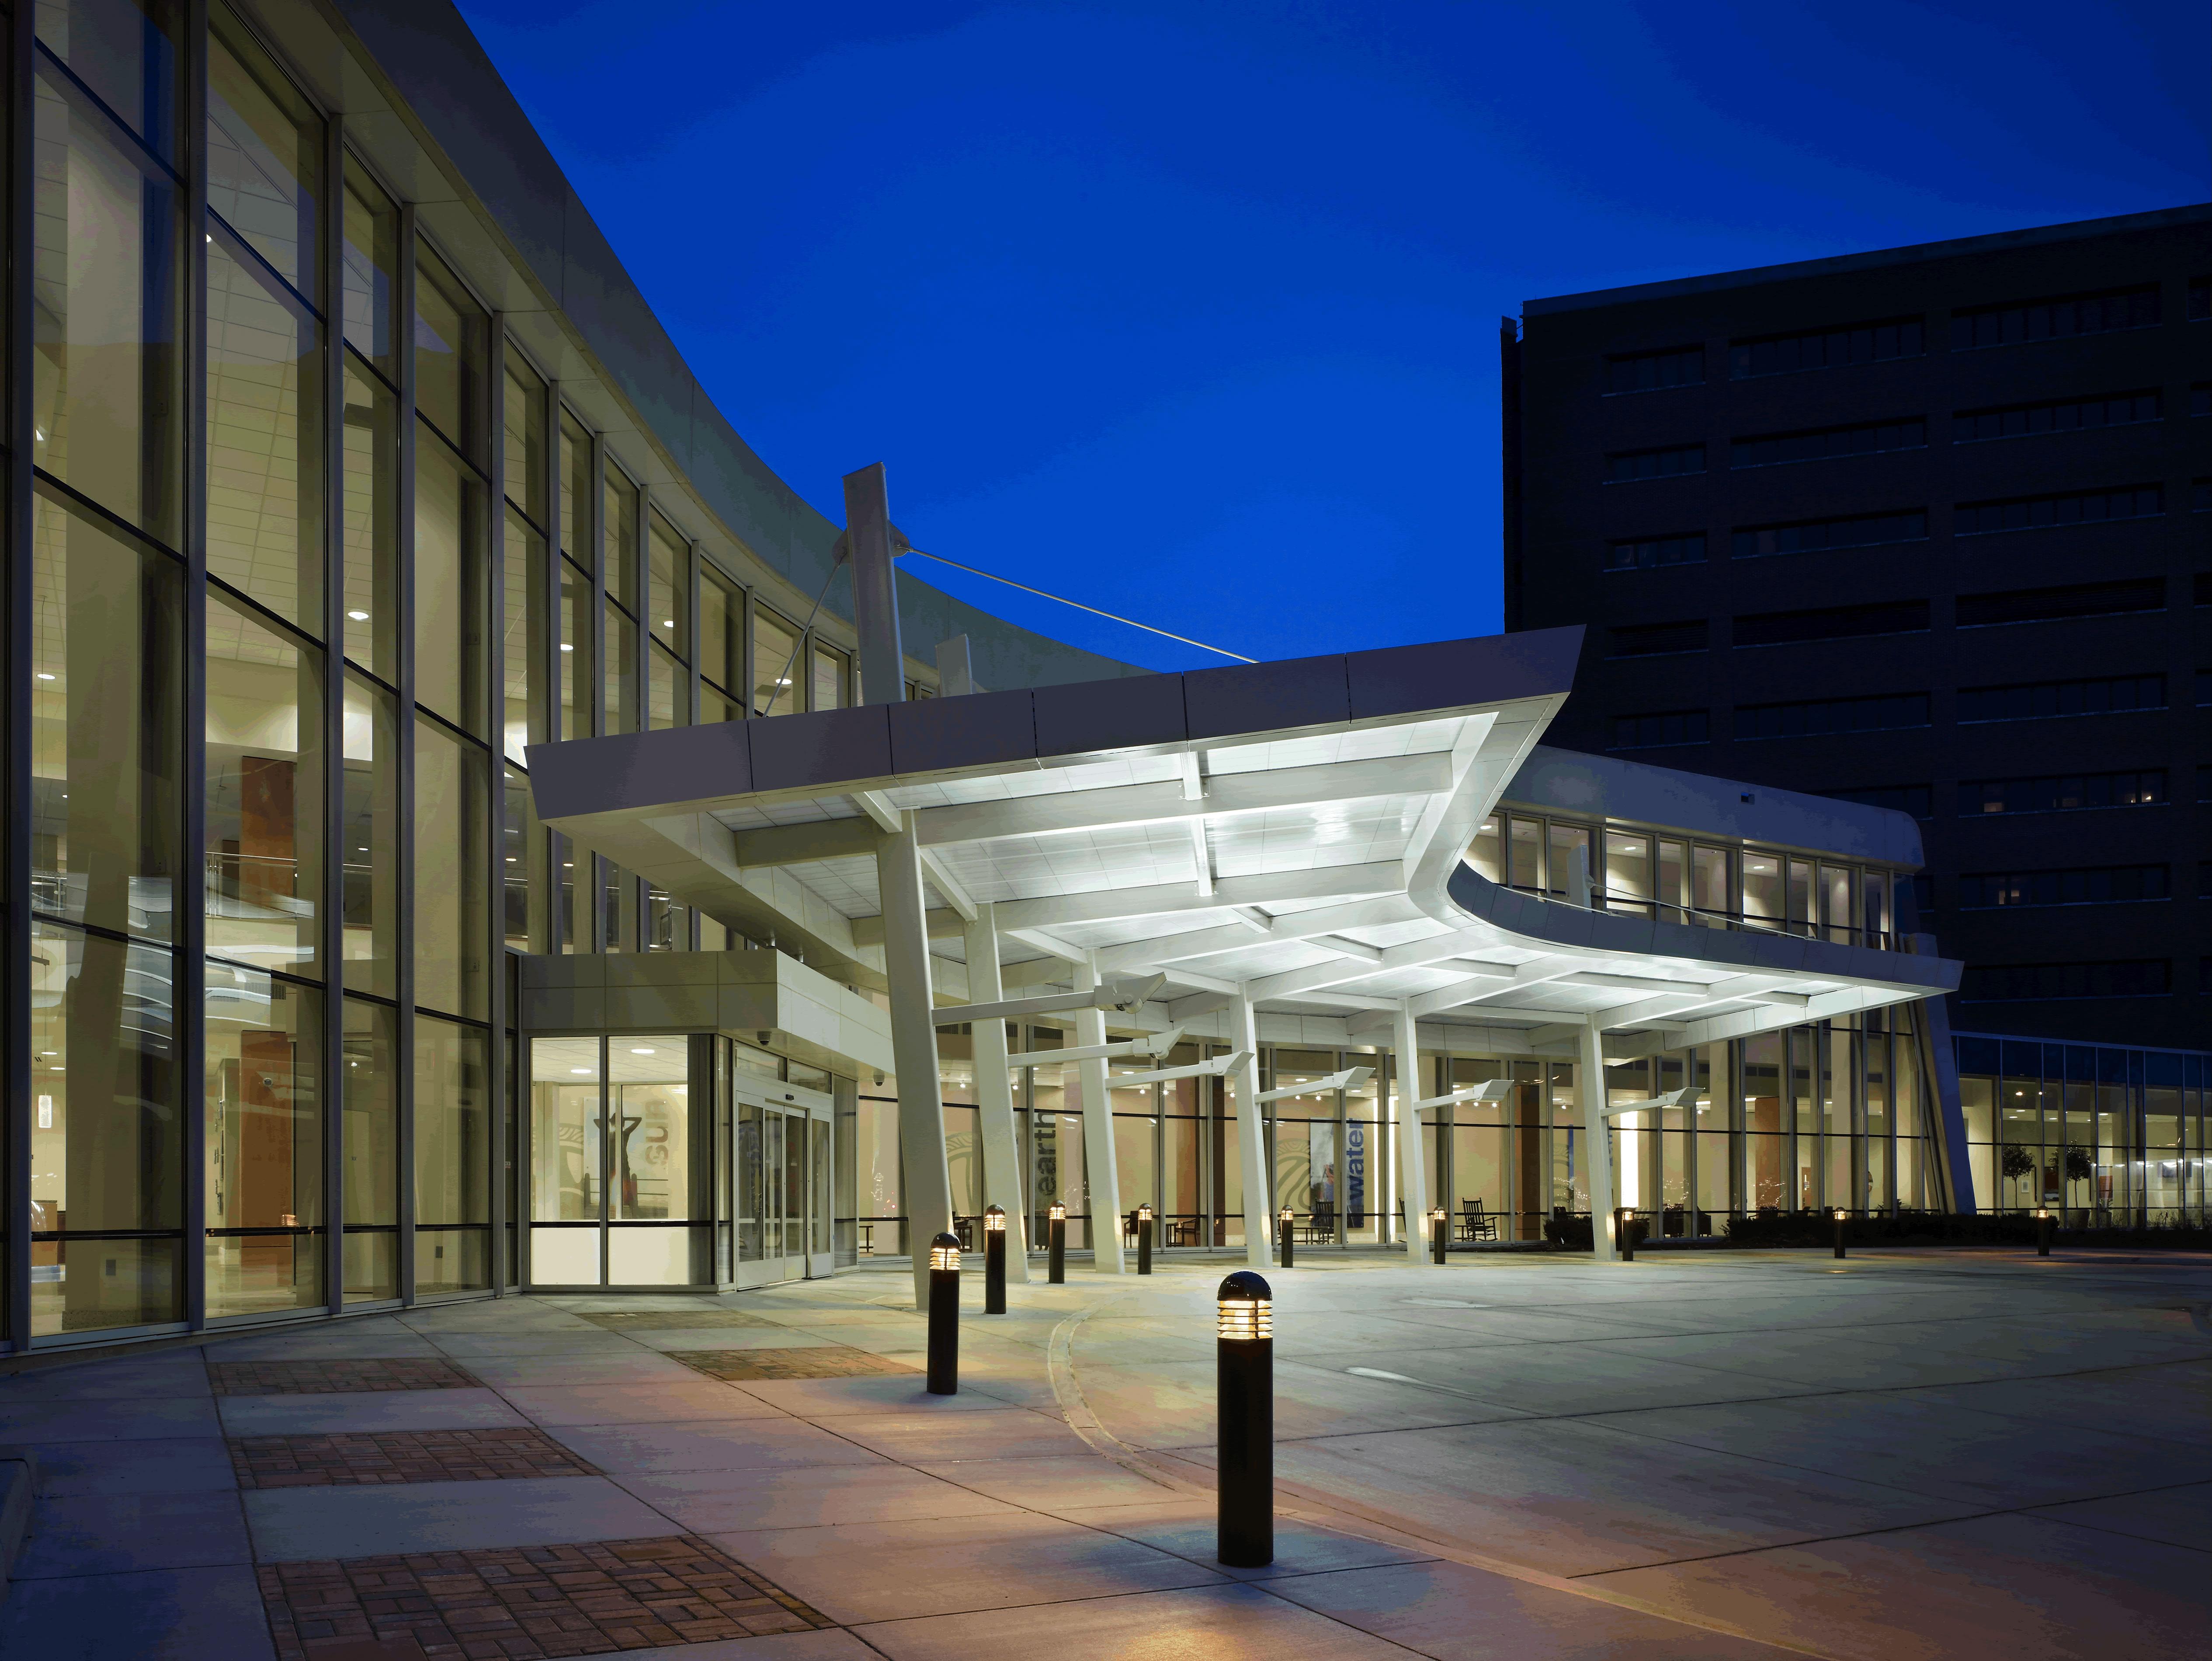 The Toledo Hospital